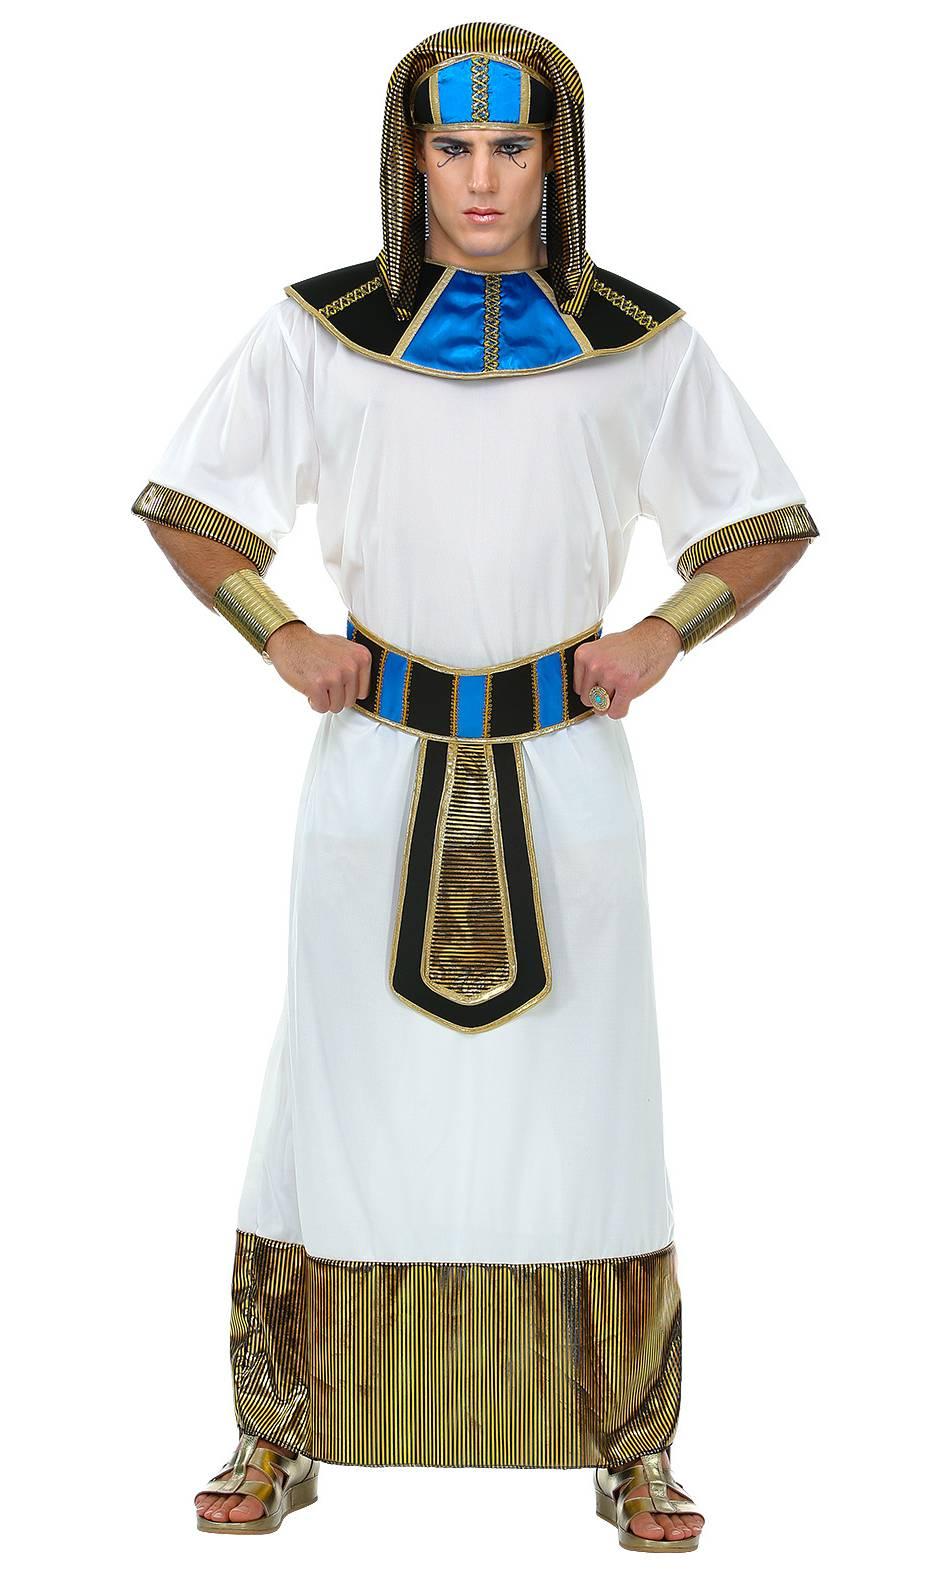 Costume-Pharaon-égyptien